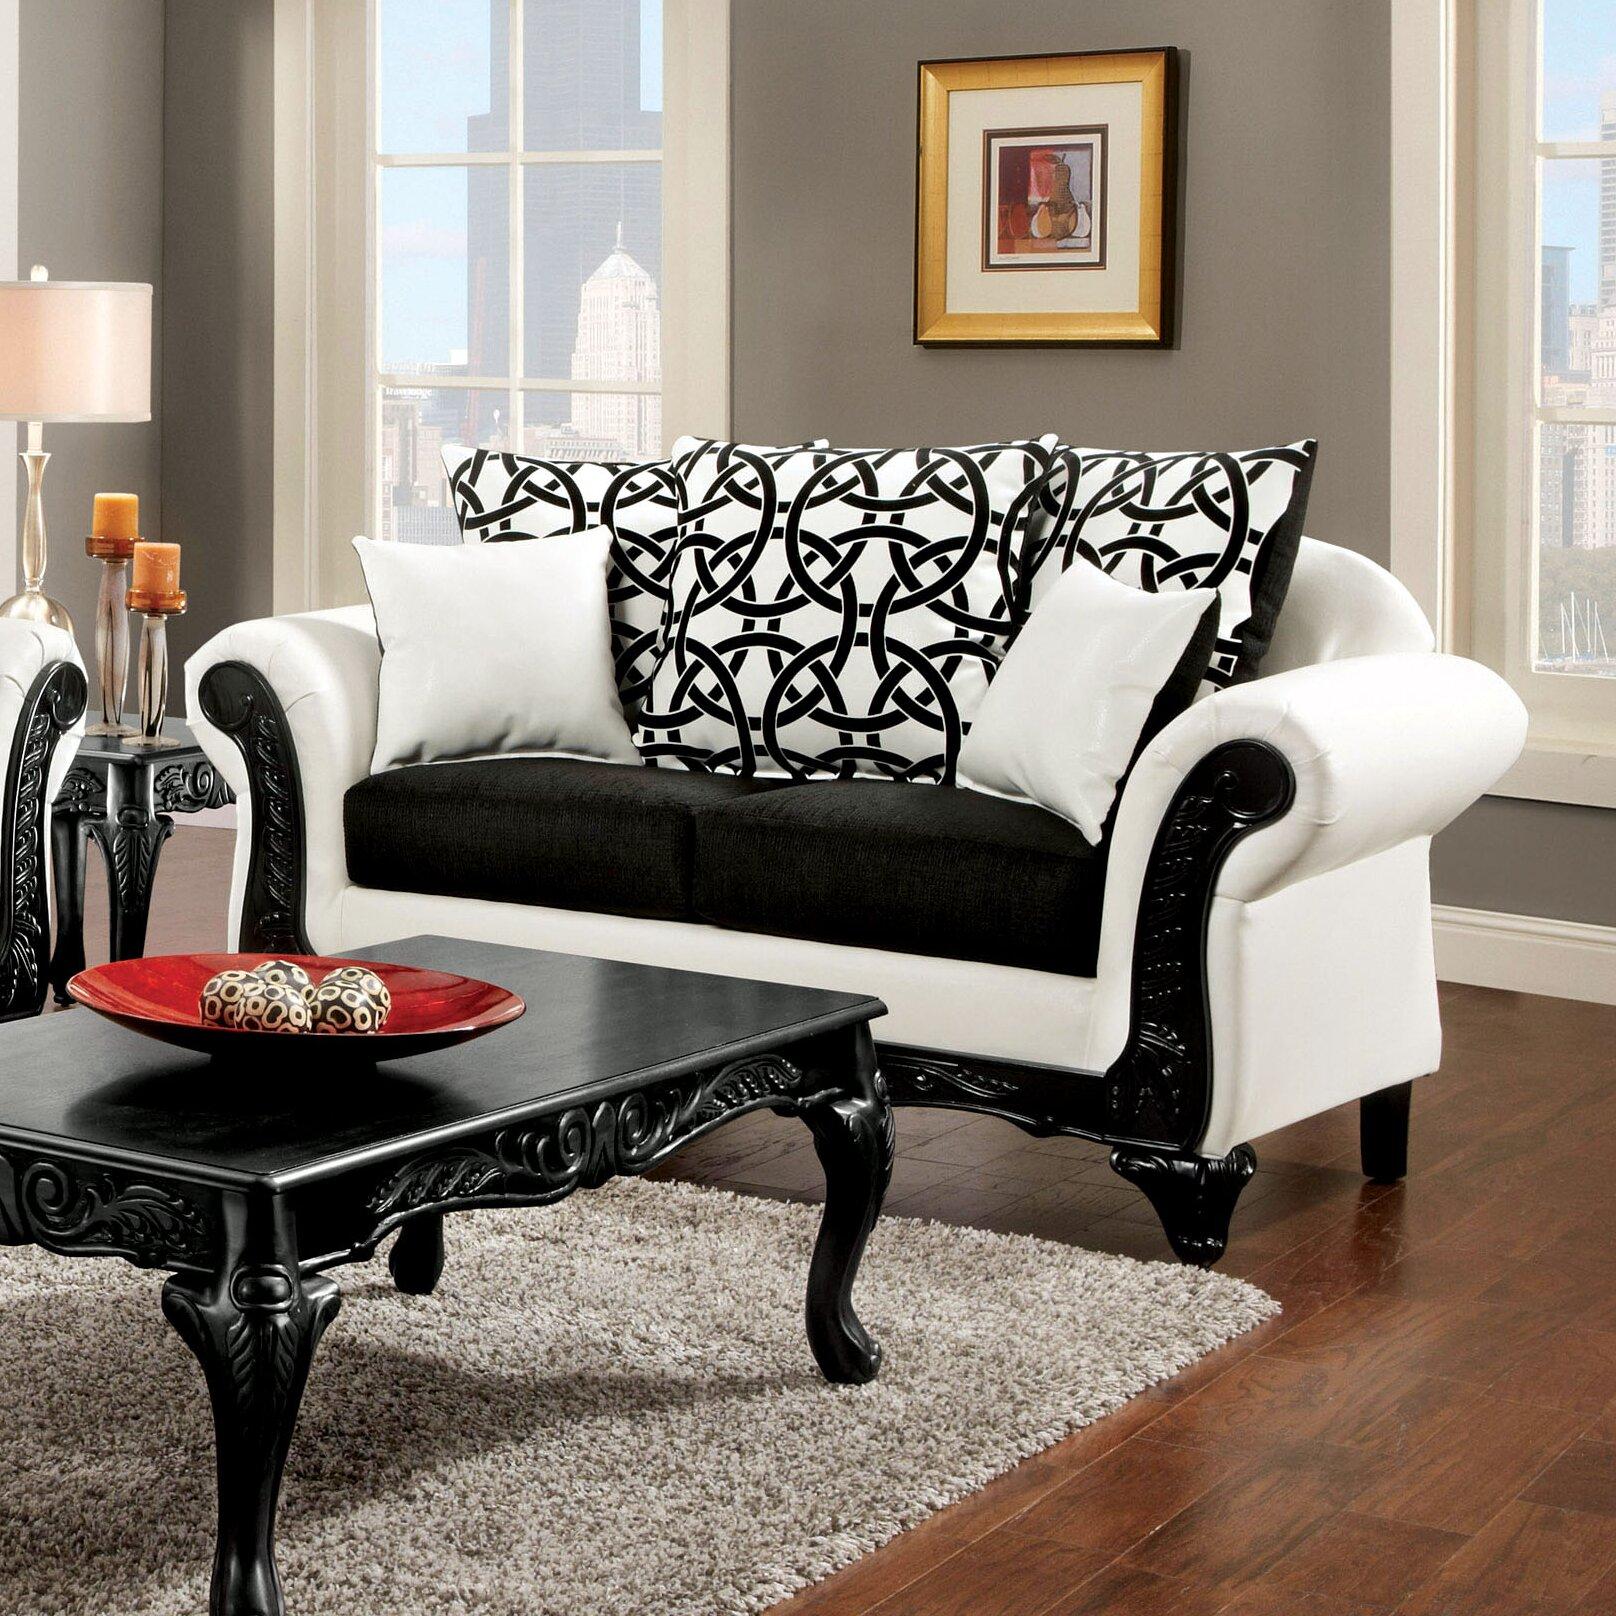 Hokku designs reylan living room collection reviews for Hokku designs living room furniture